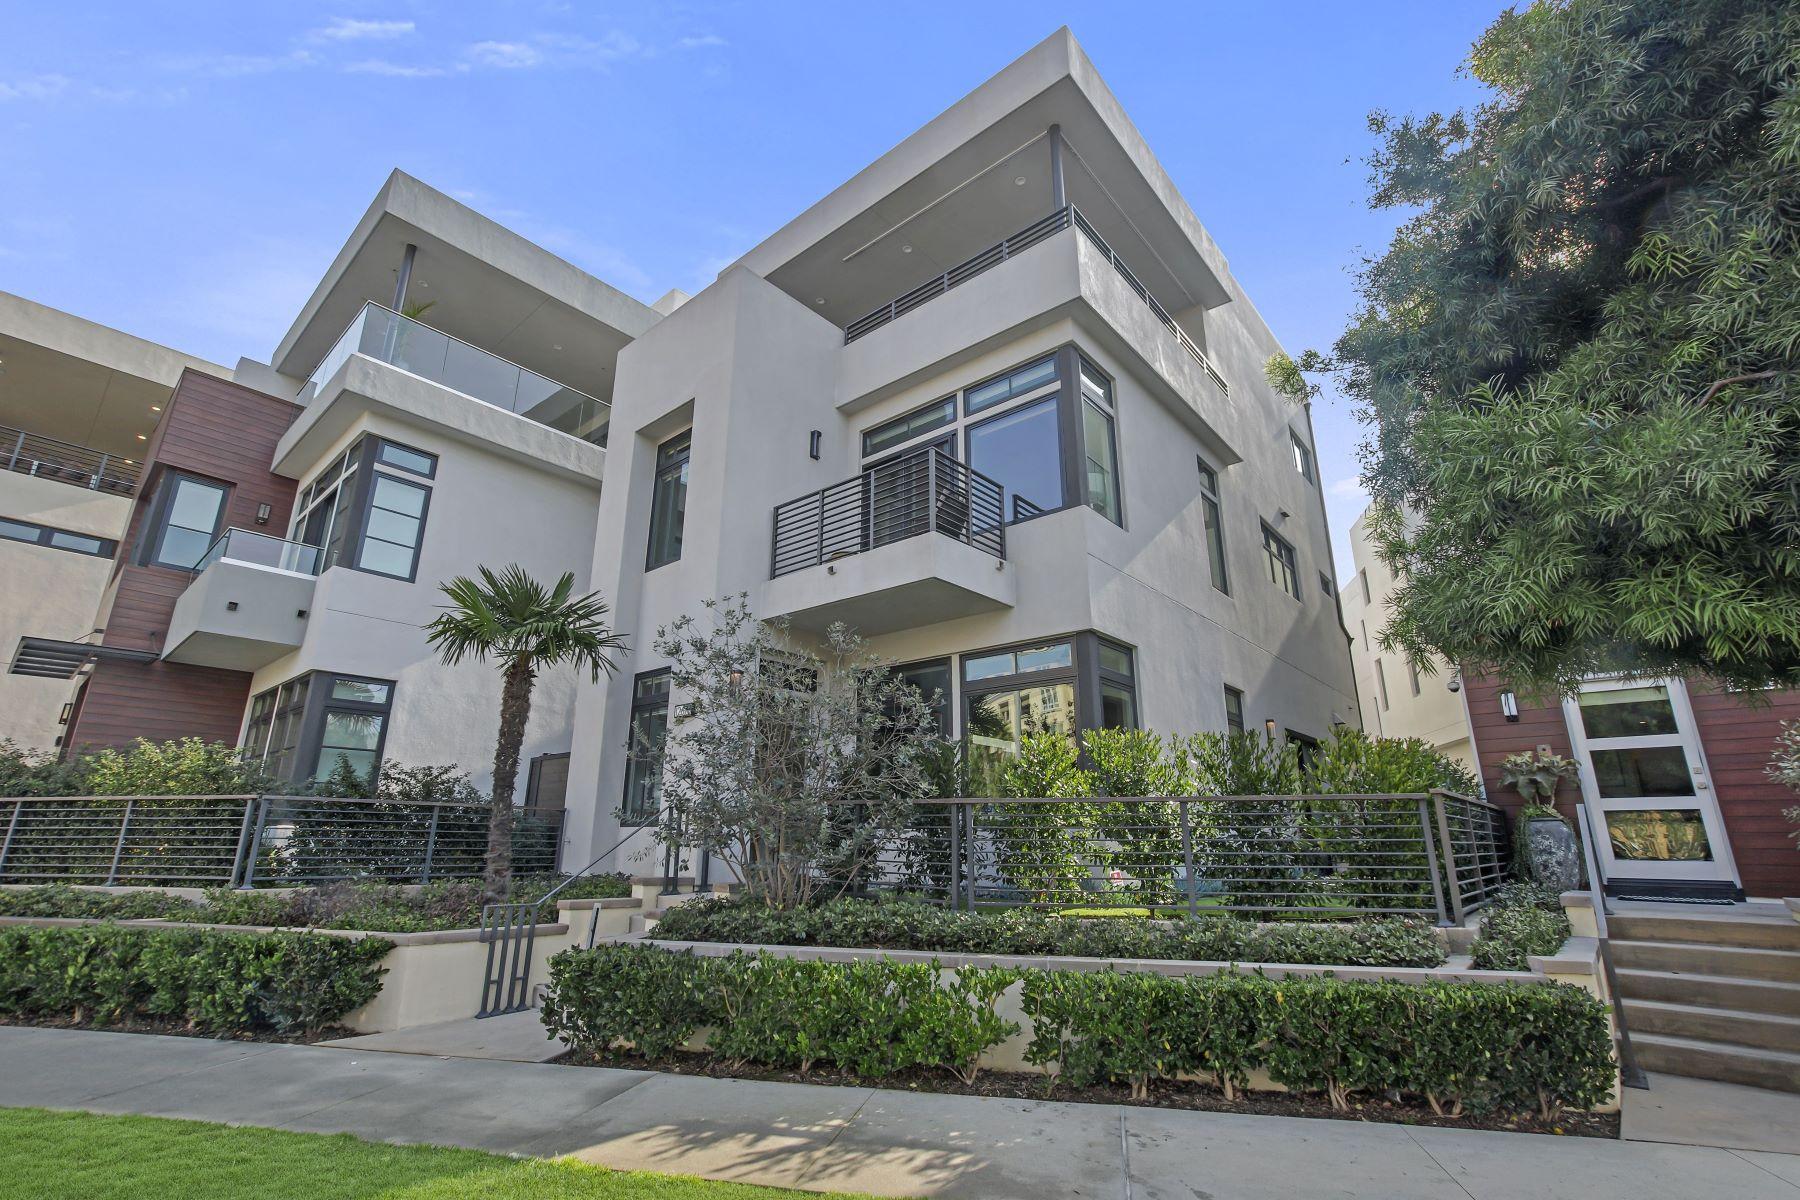 Single Family Homes 为 销售 在 12678 Millennium Drive, Los Angeles, CA 90094 12678 Millennium Drive 洛杉矶, 加利福尼亚州 90094 美国